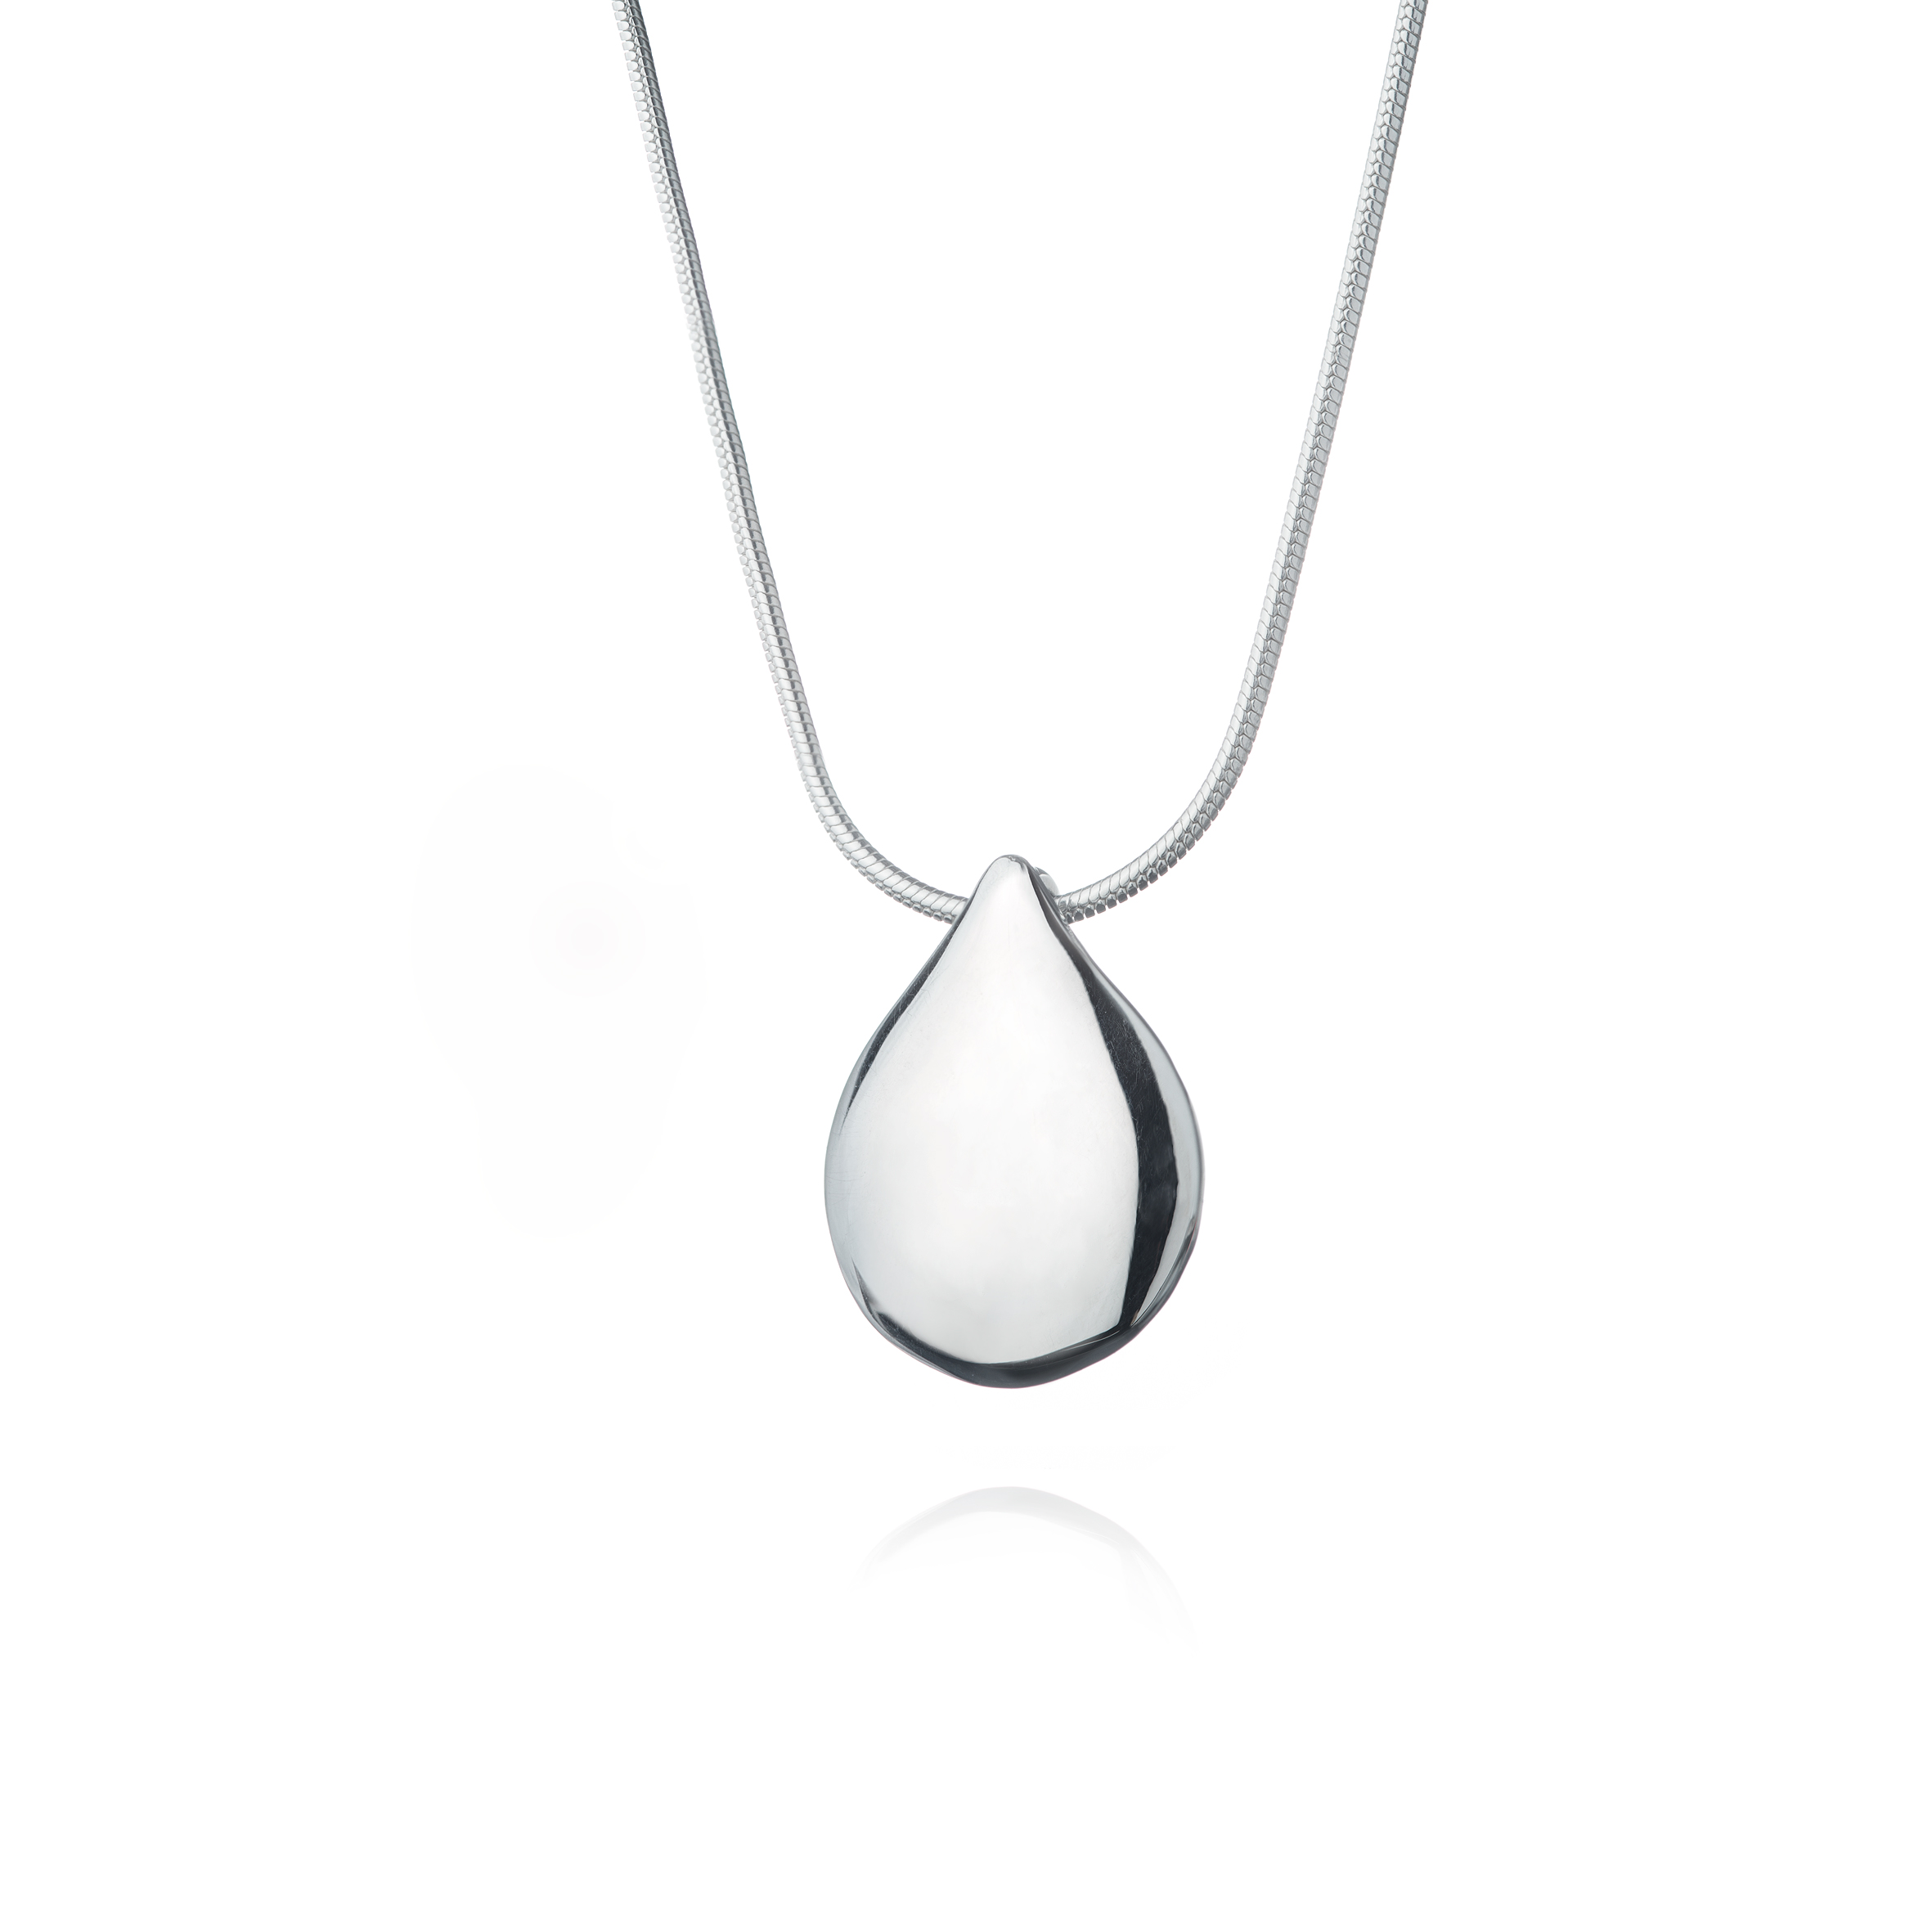 N-Drop-small_Silver